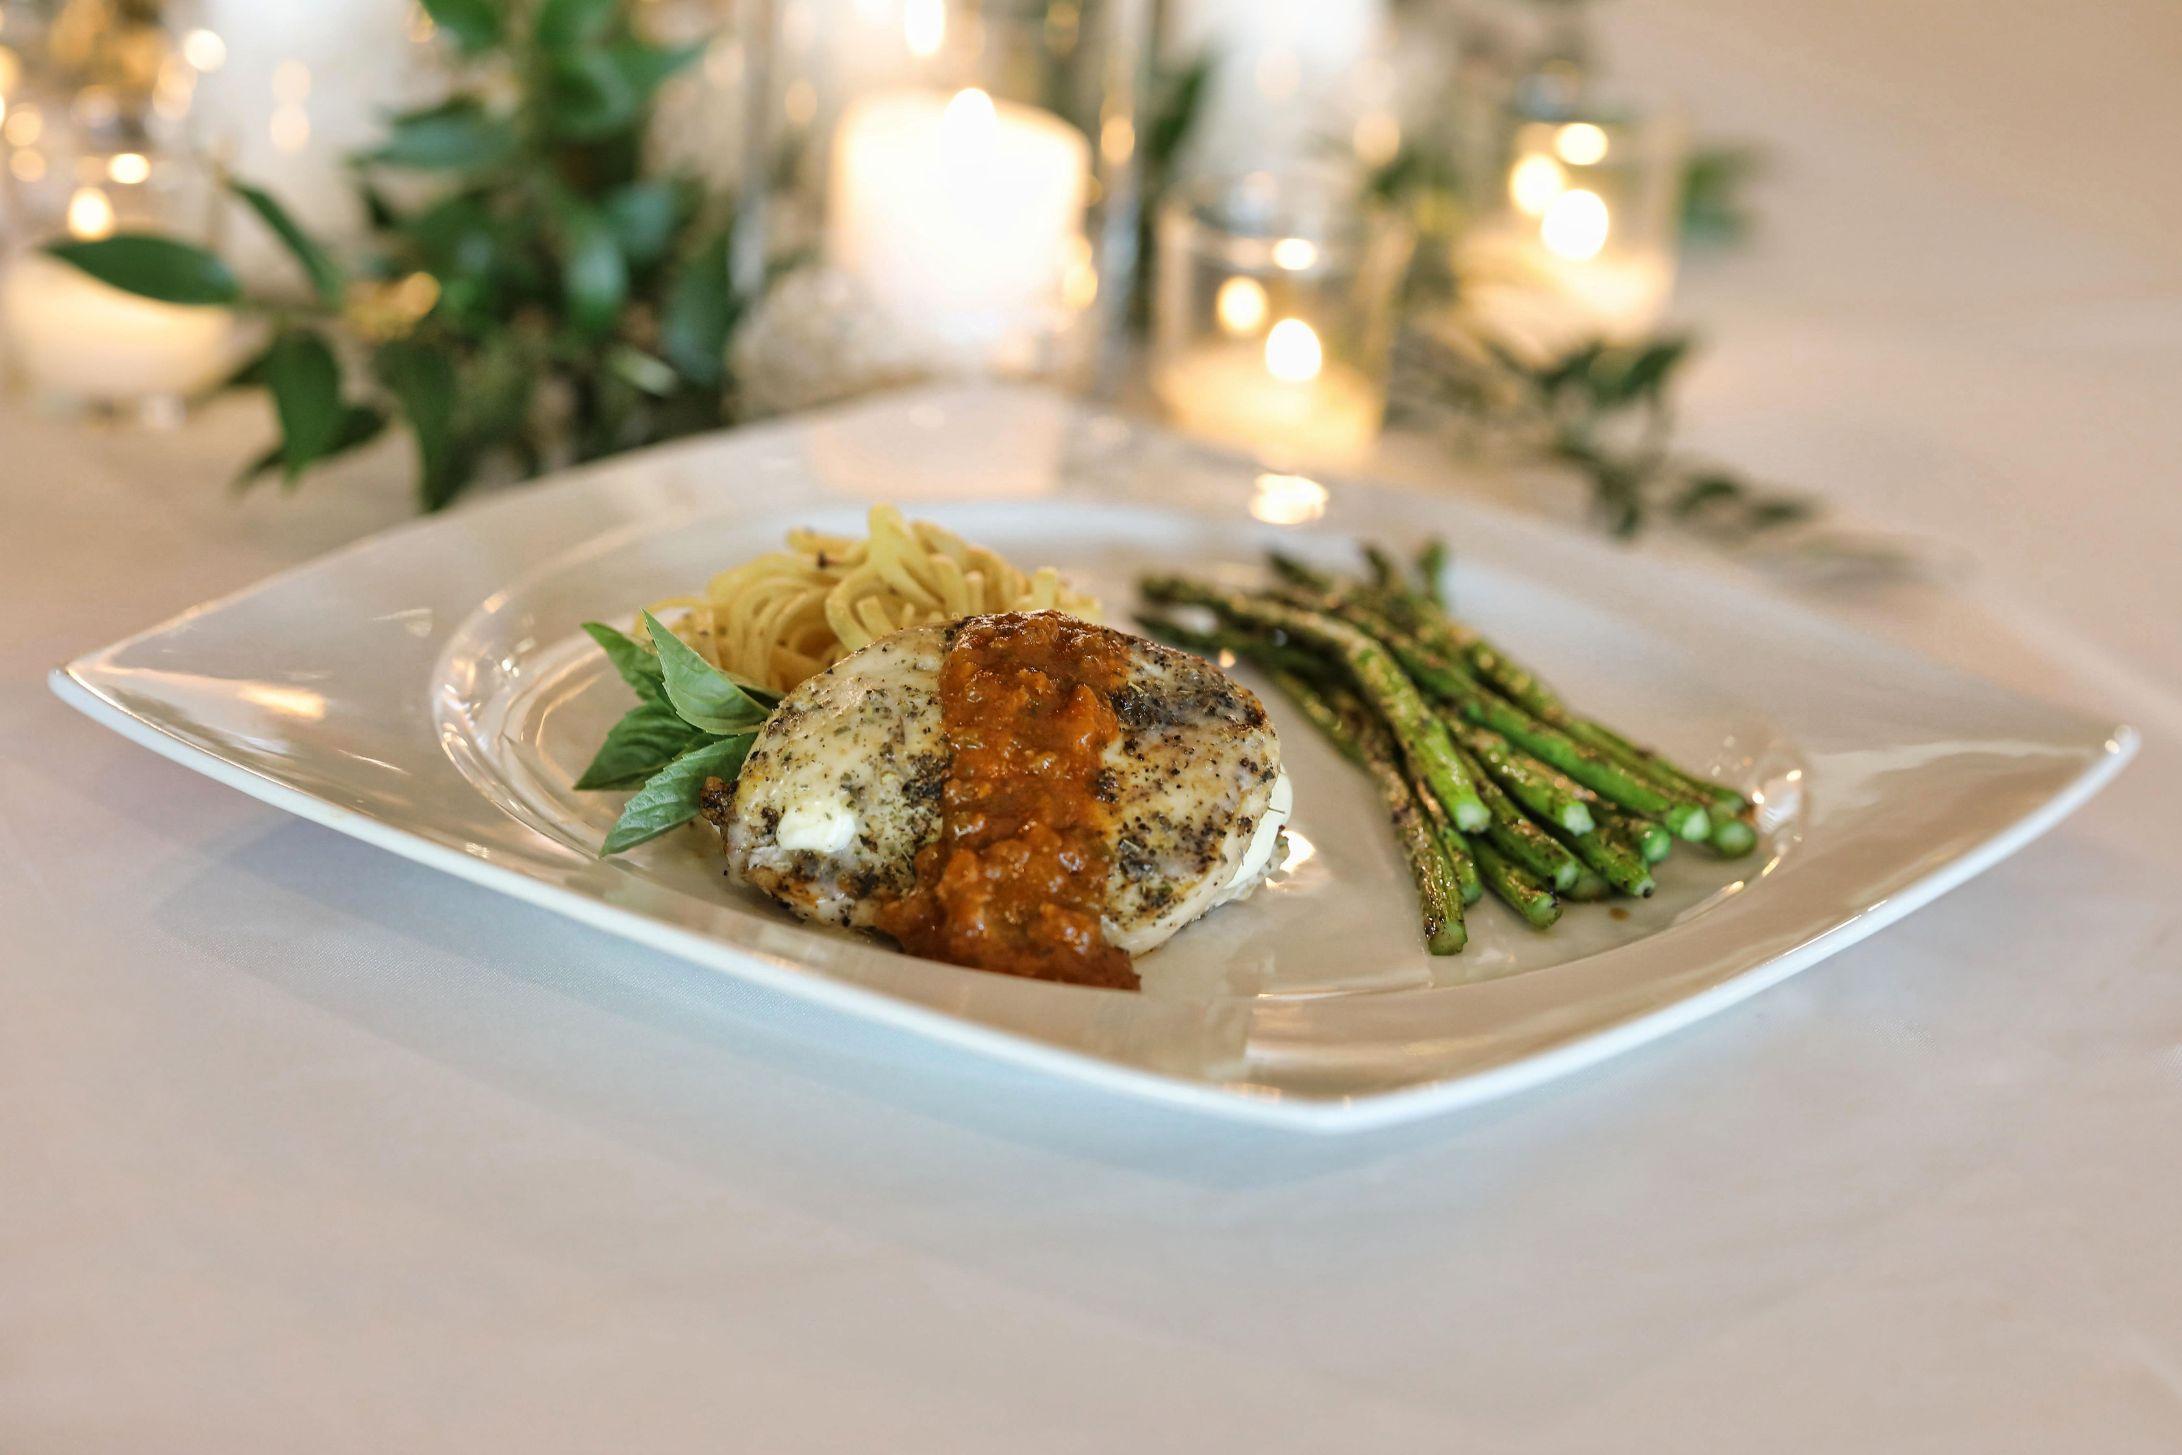 2Z8A9274 nashville wedding venue lebanon tn tennessee wedding venue rustic overnight stay catering 1